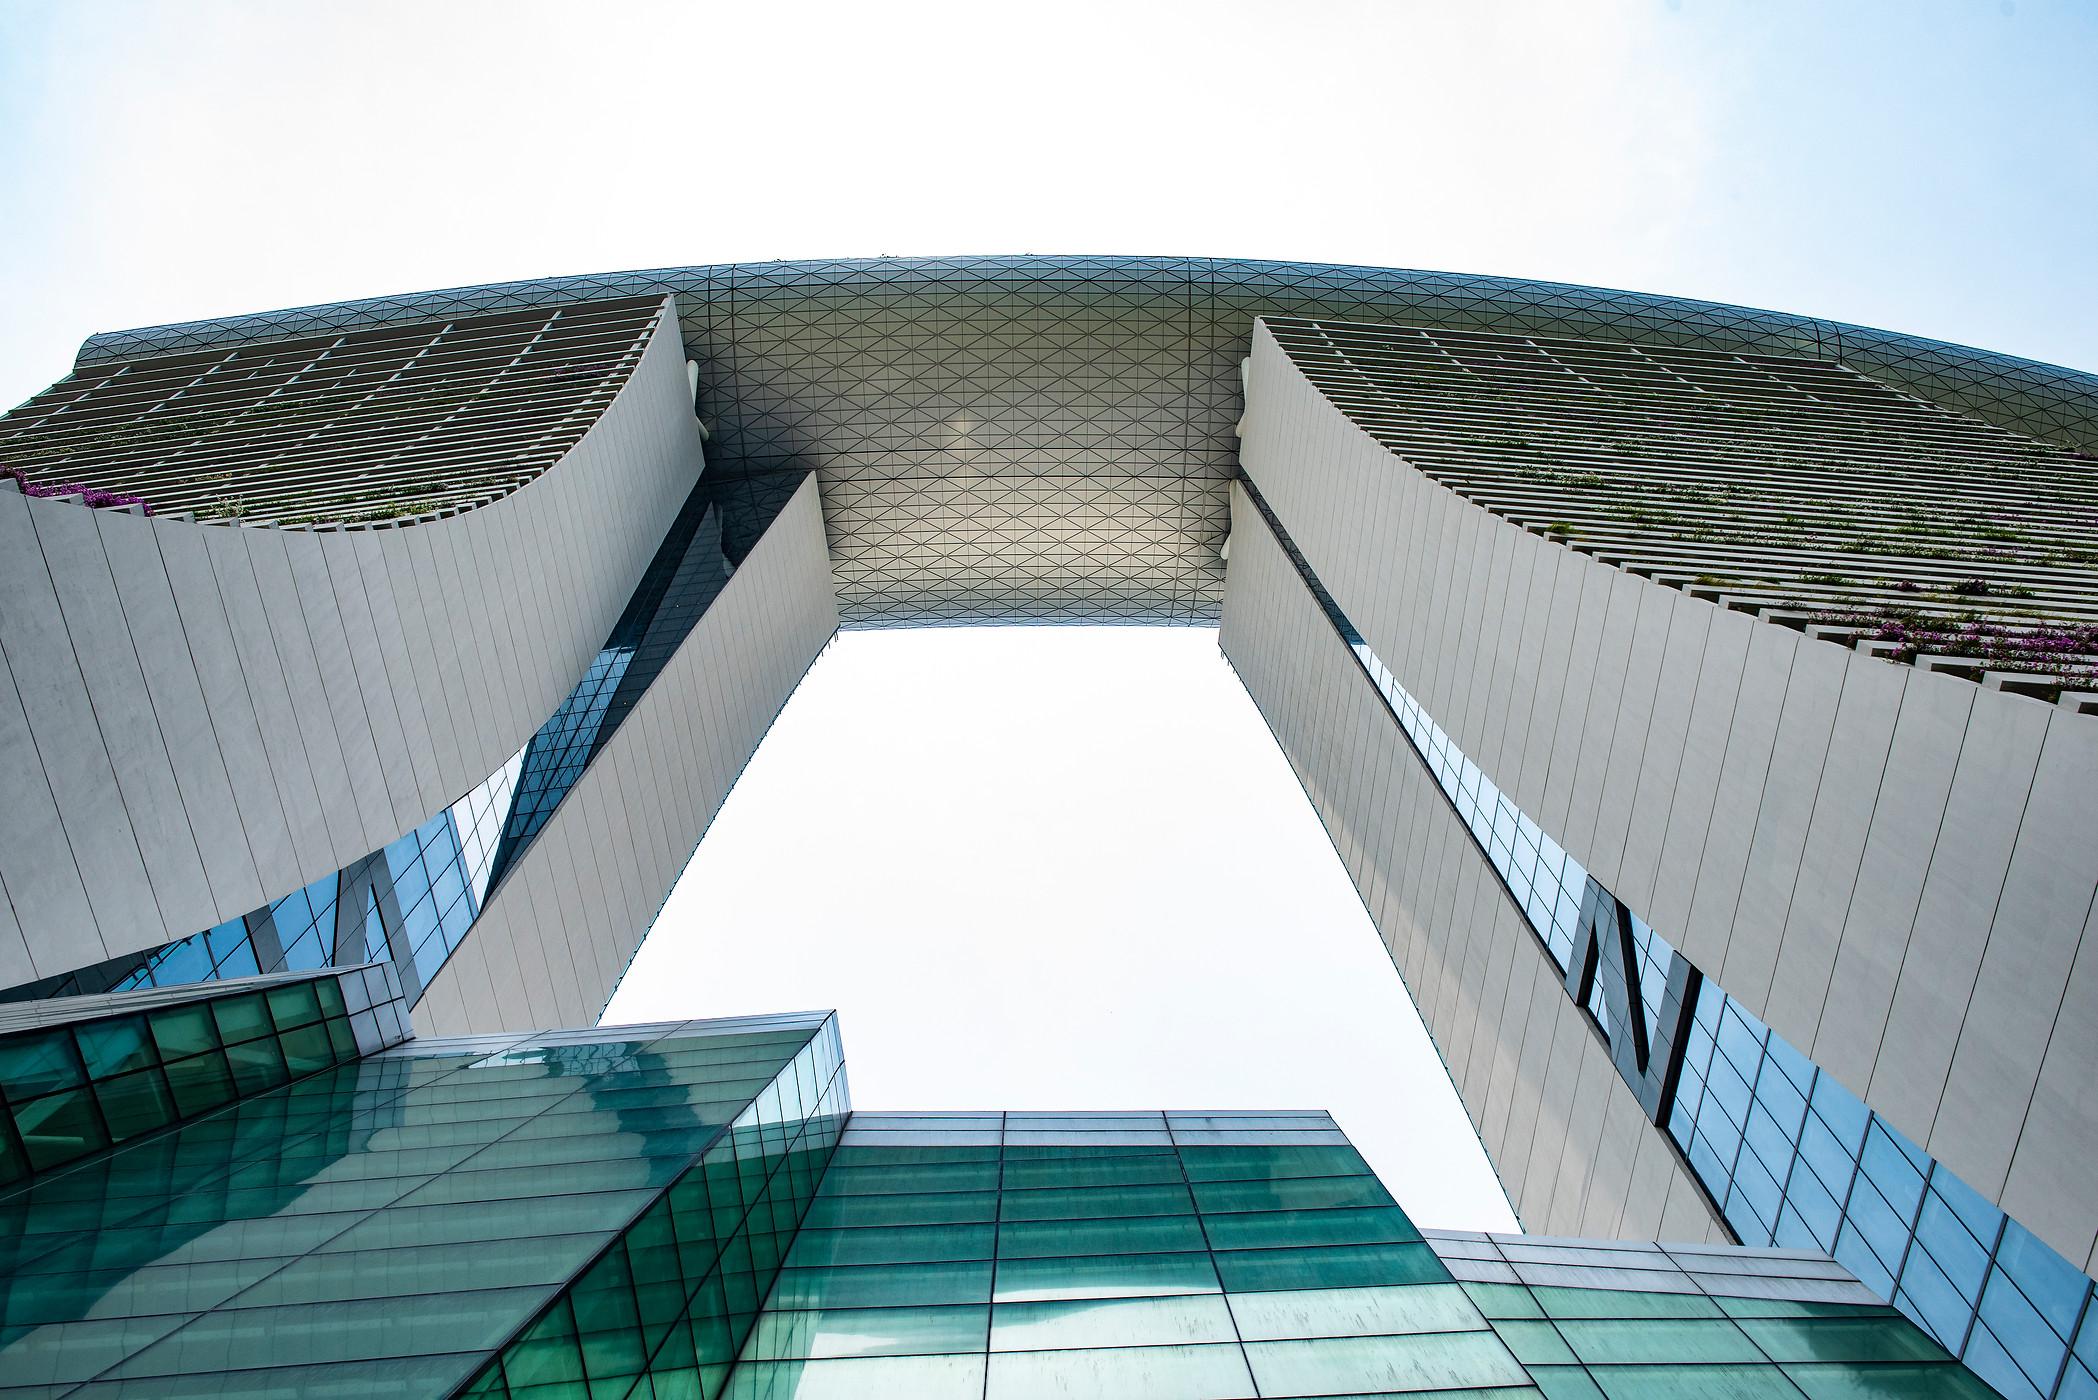 #marinabaysandshotel #singapre #architecture #interiors #architecturephotogrphy #shanefinnphotography